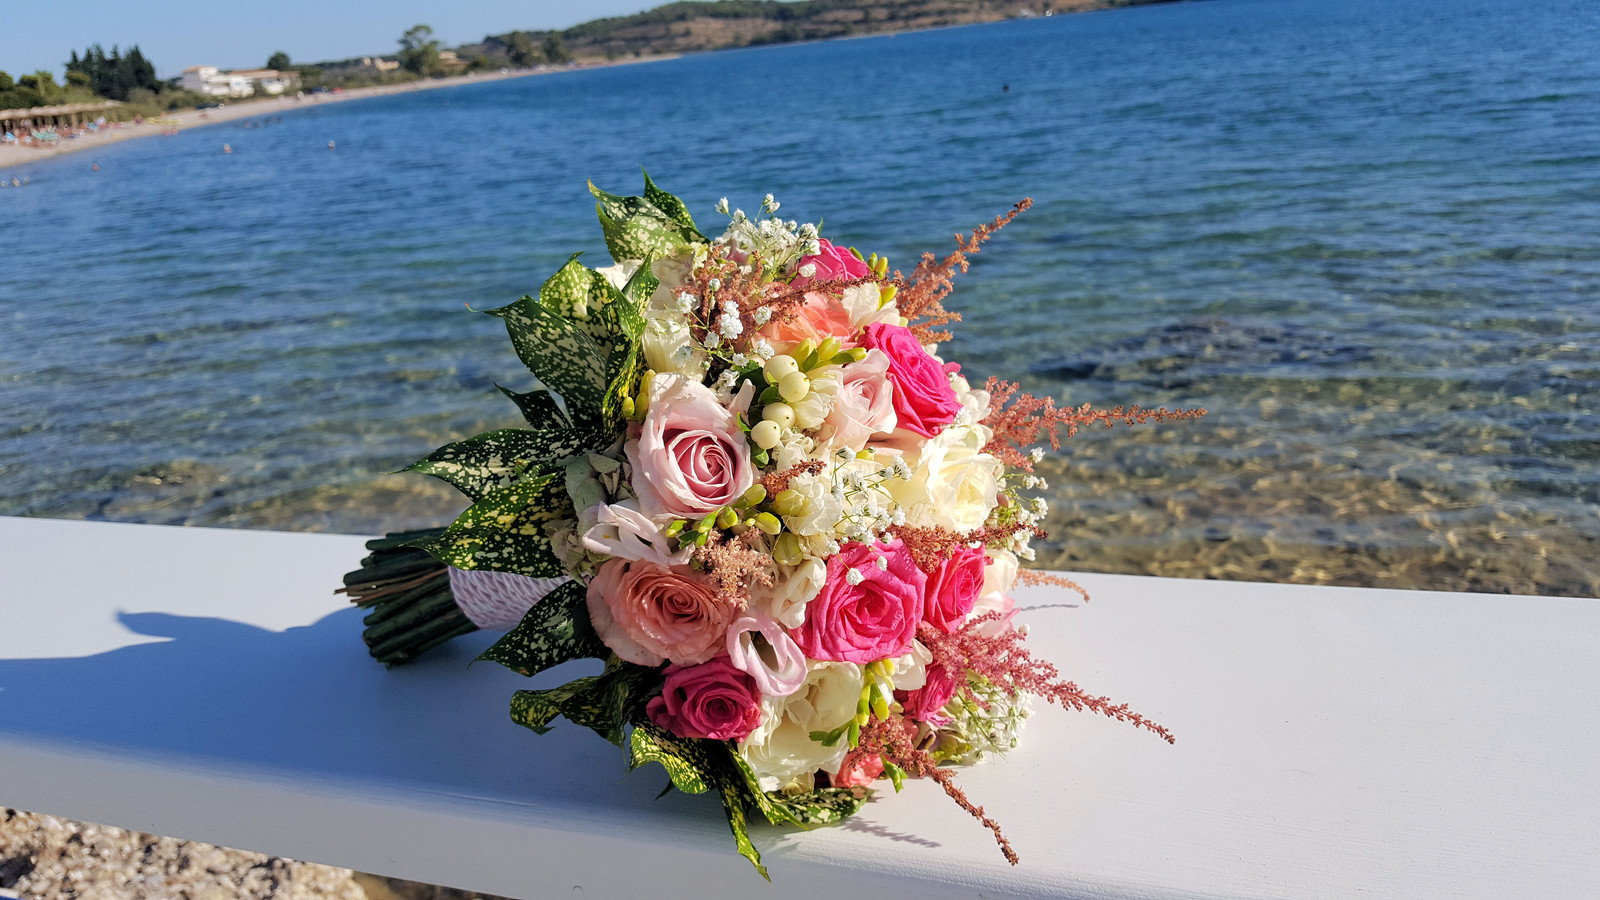 dc2f7e747678 Νυφική ανθοδέσμη γάμου σε λευκό